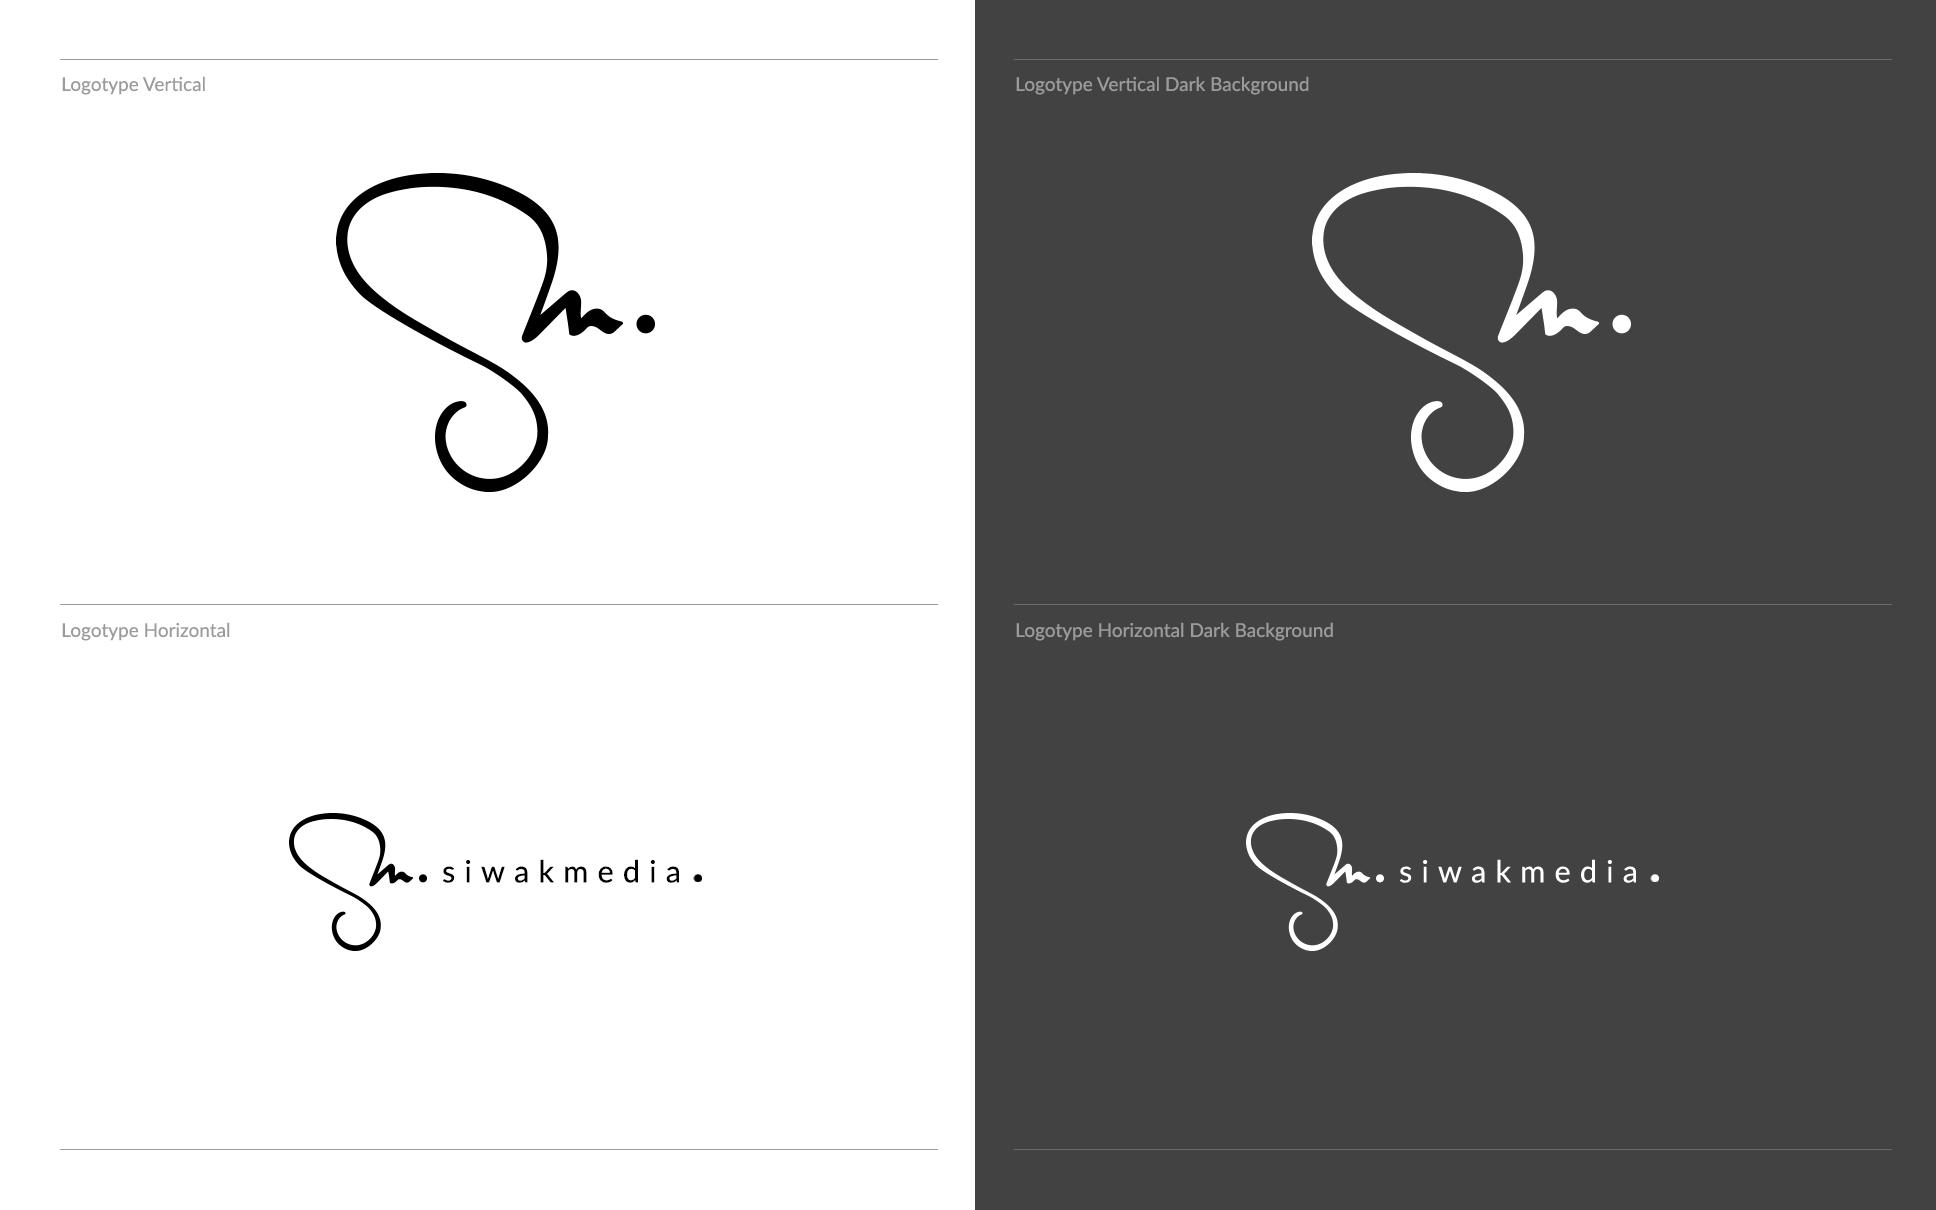 logo_placement_v2